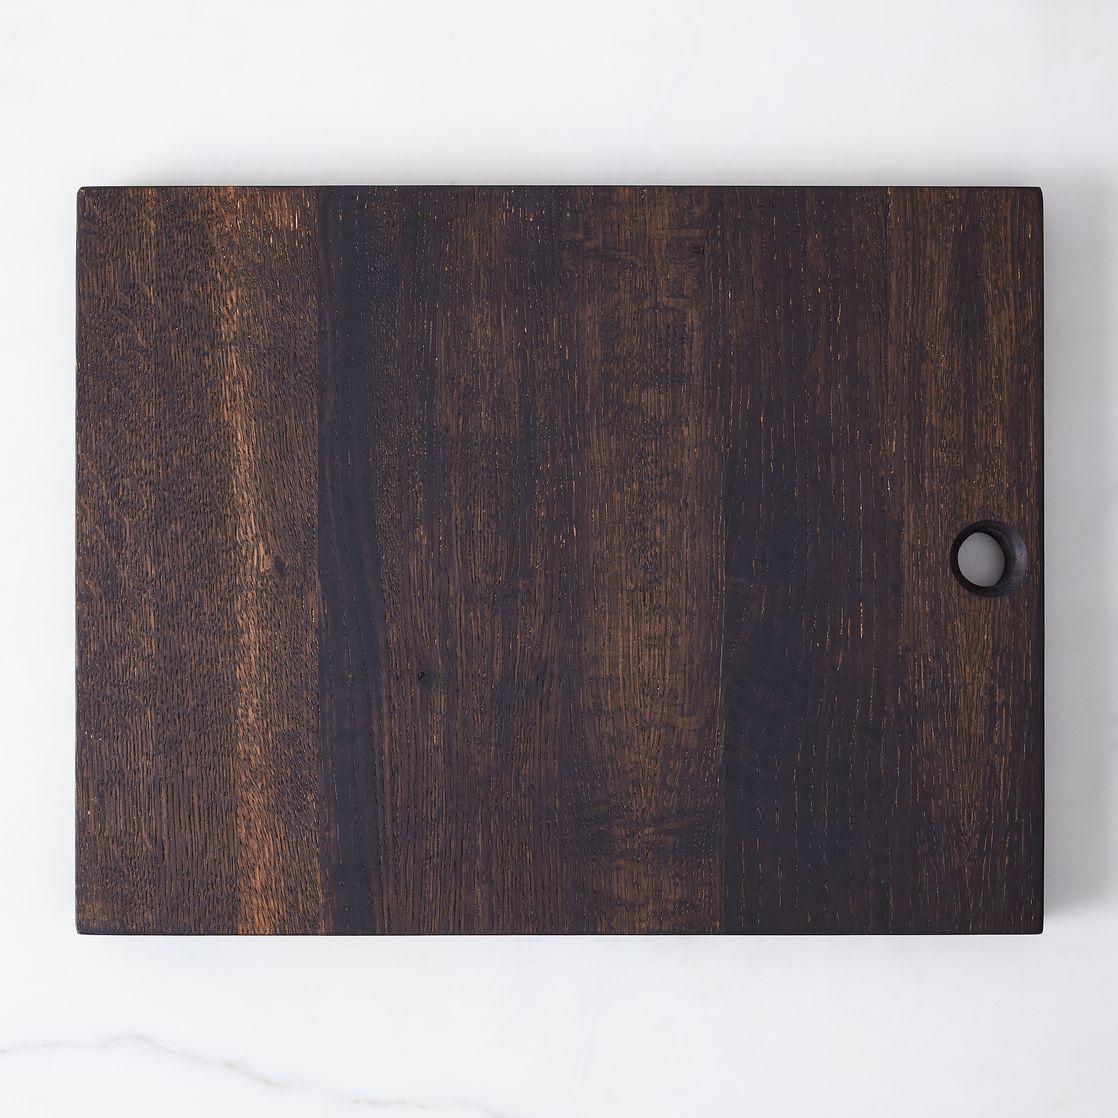 Oxidized-Oak-Cutting-Board.jpg